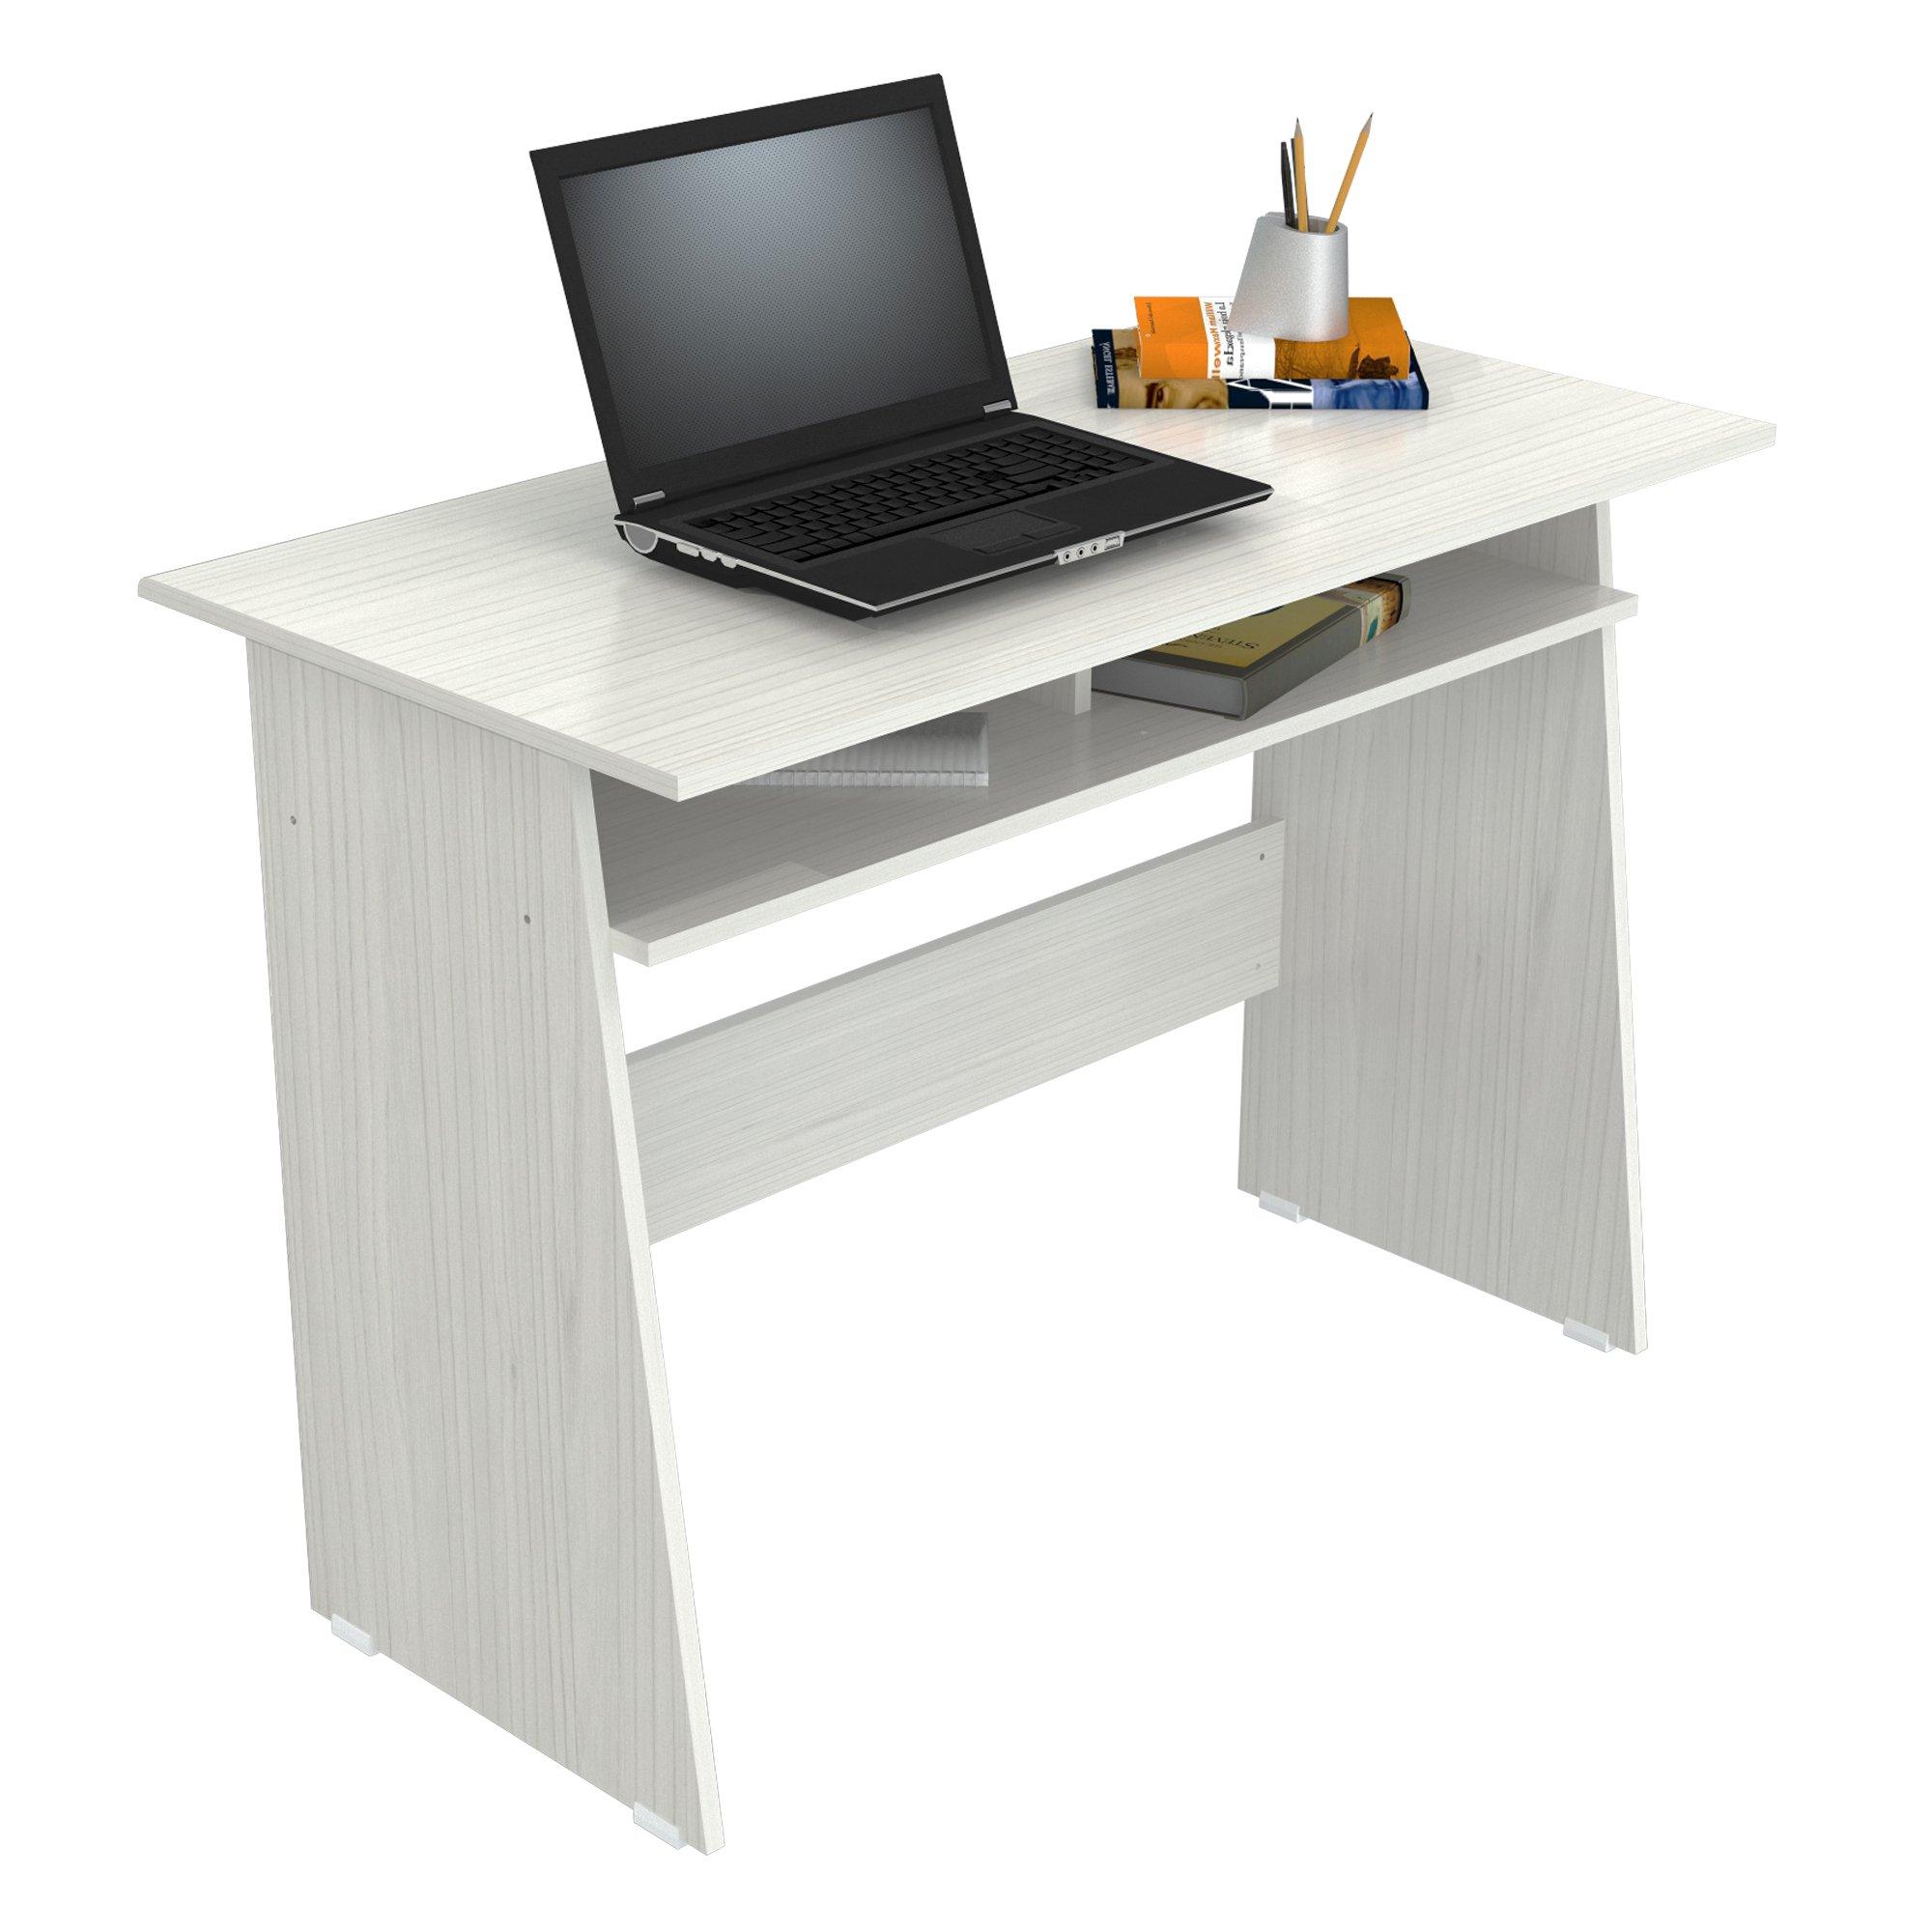 Inval ES-9003 Writing Desks, Laricina